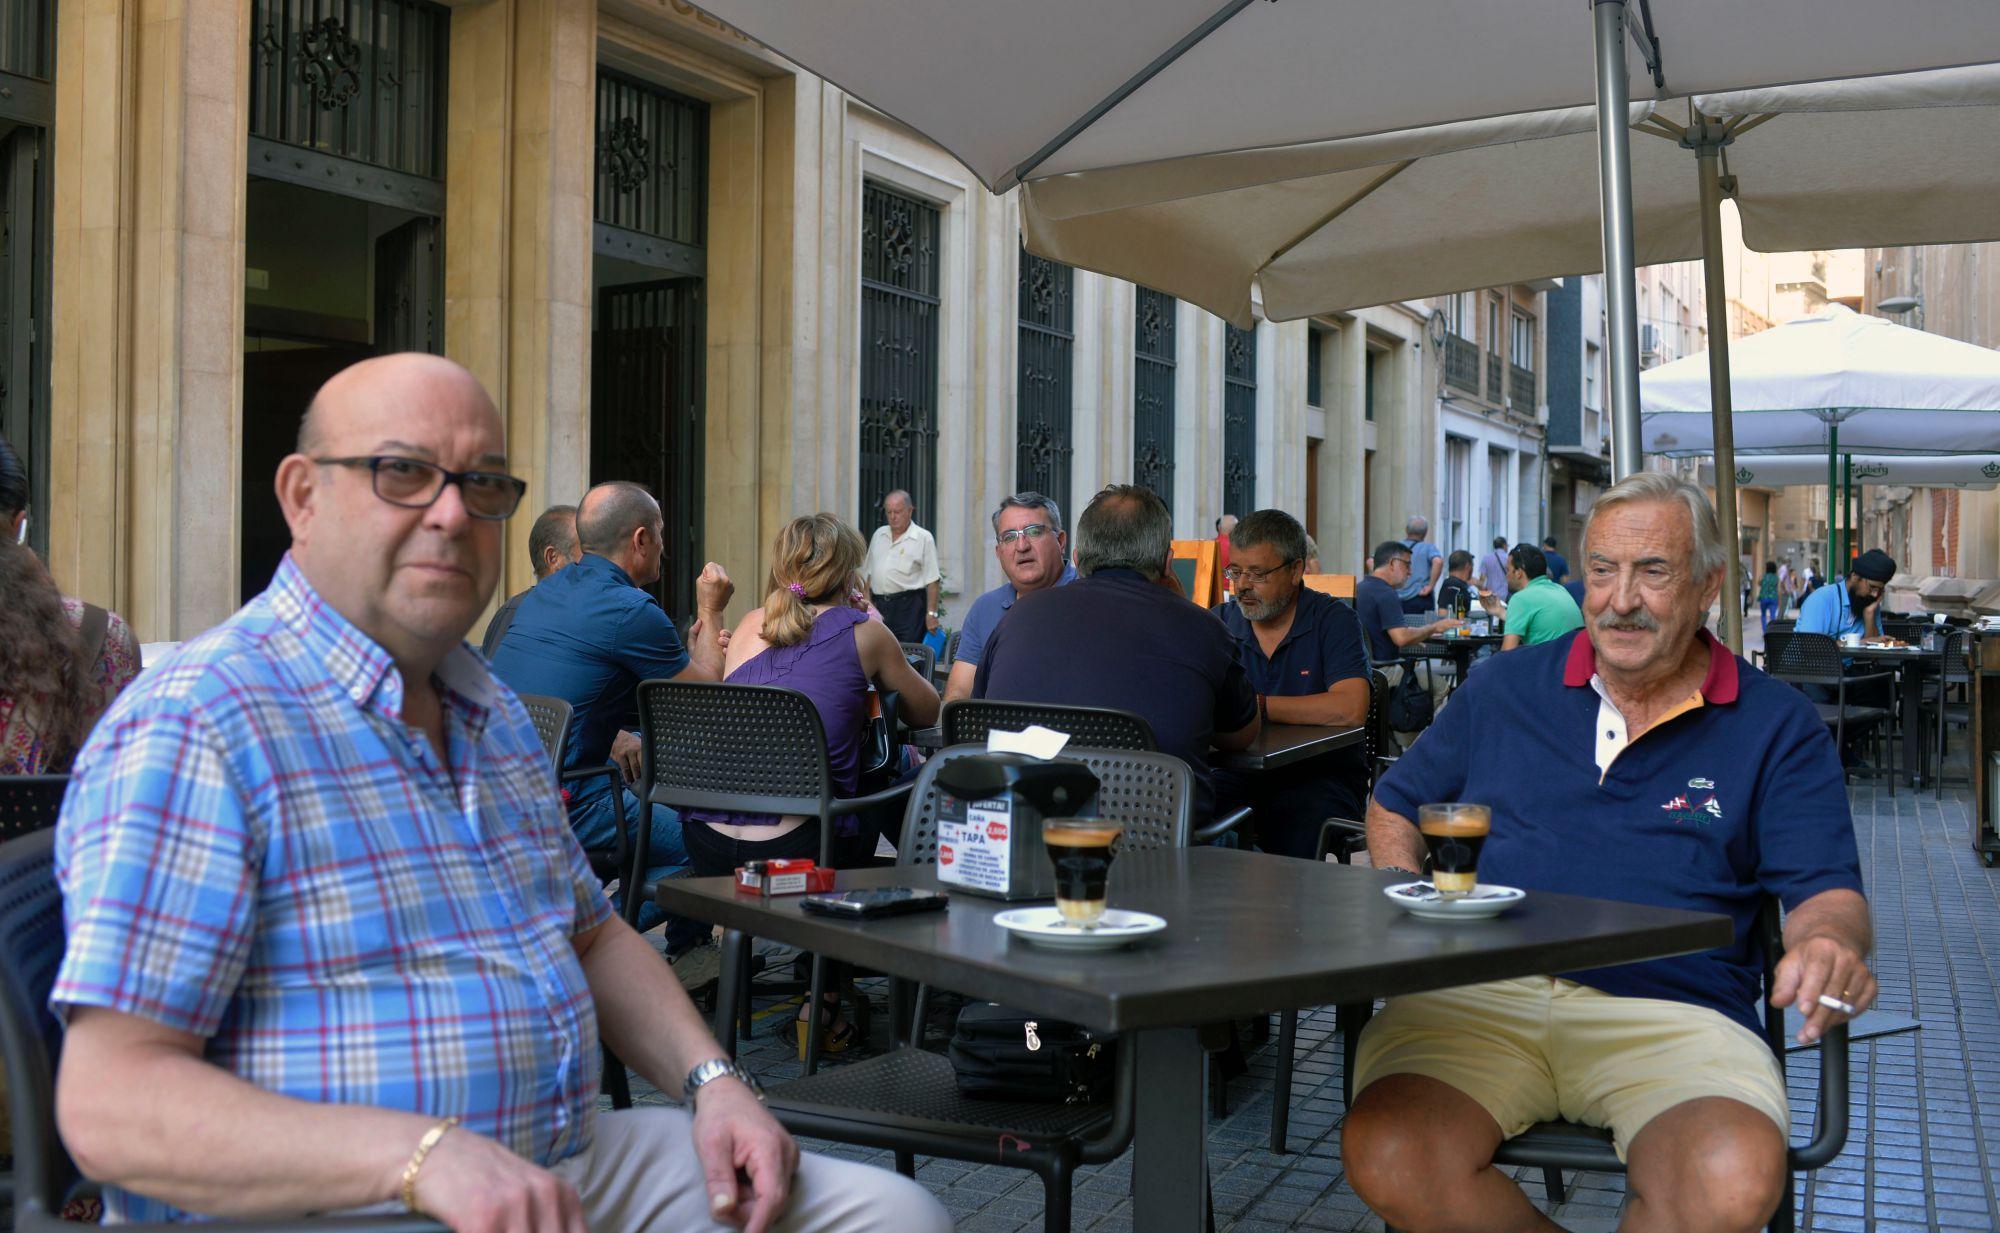 Café asiático de Cartagena (Murcia): terraza